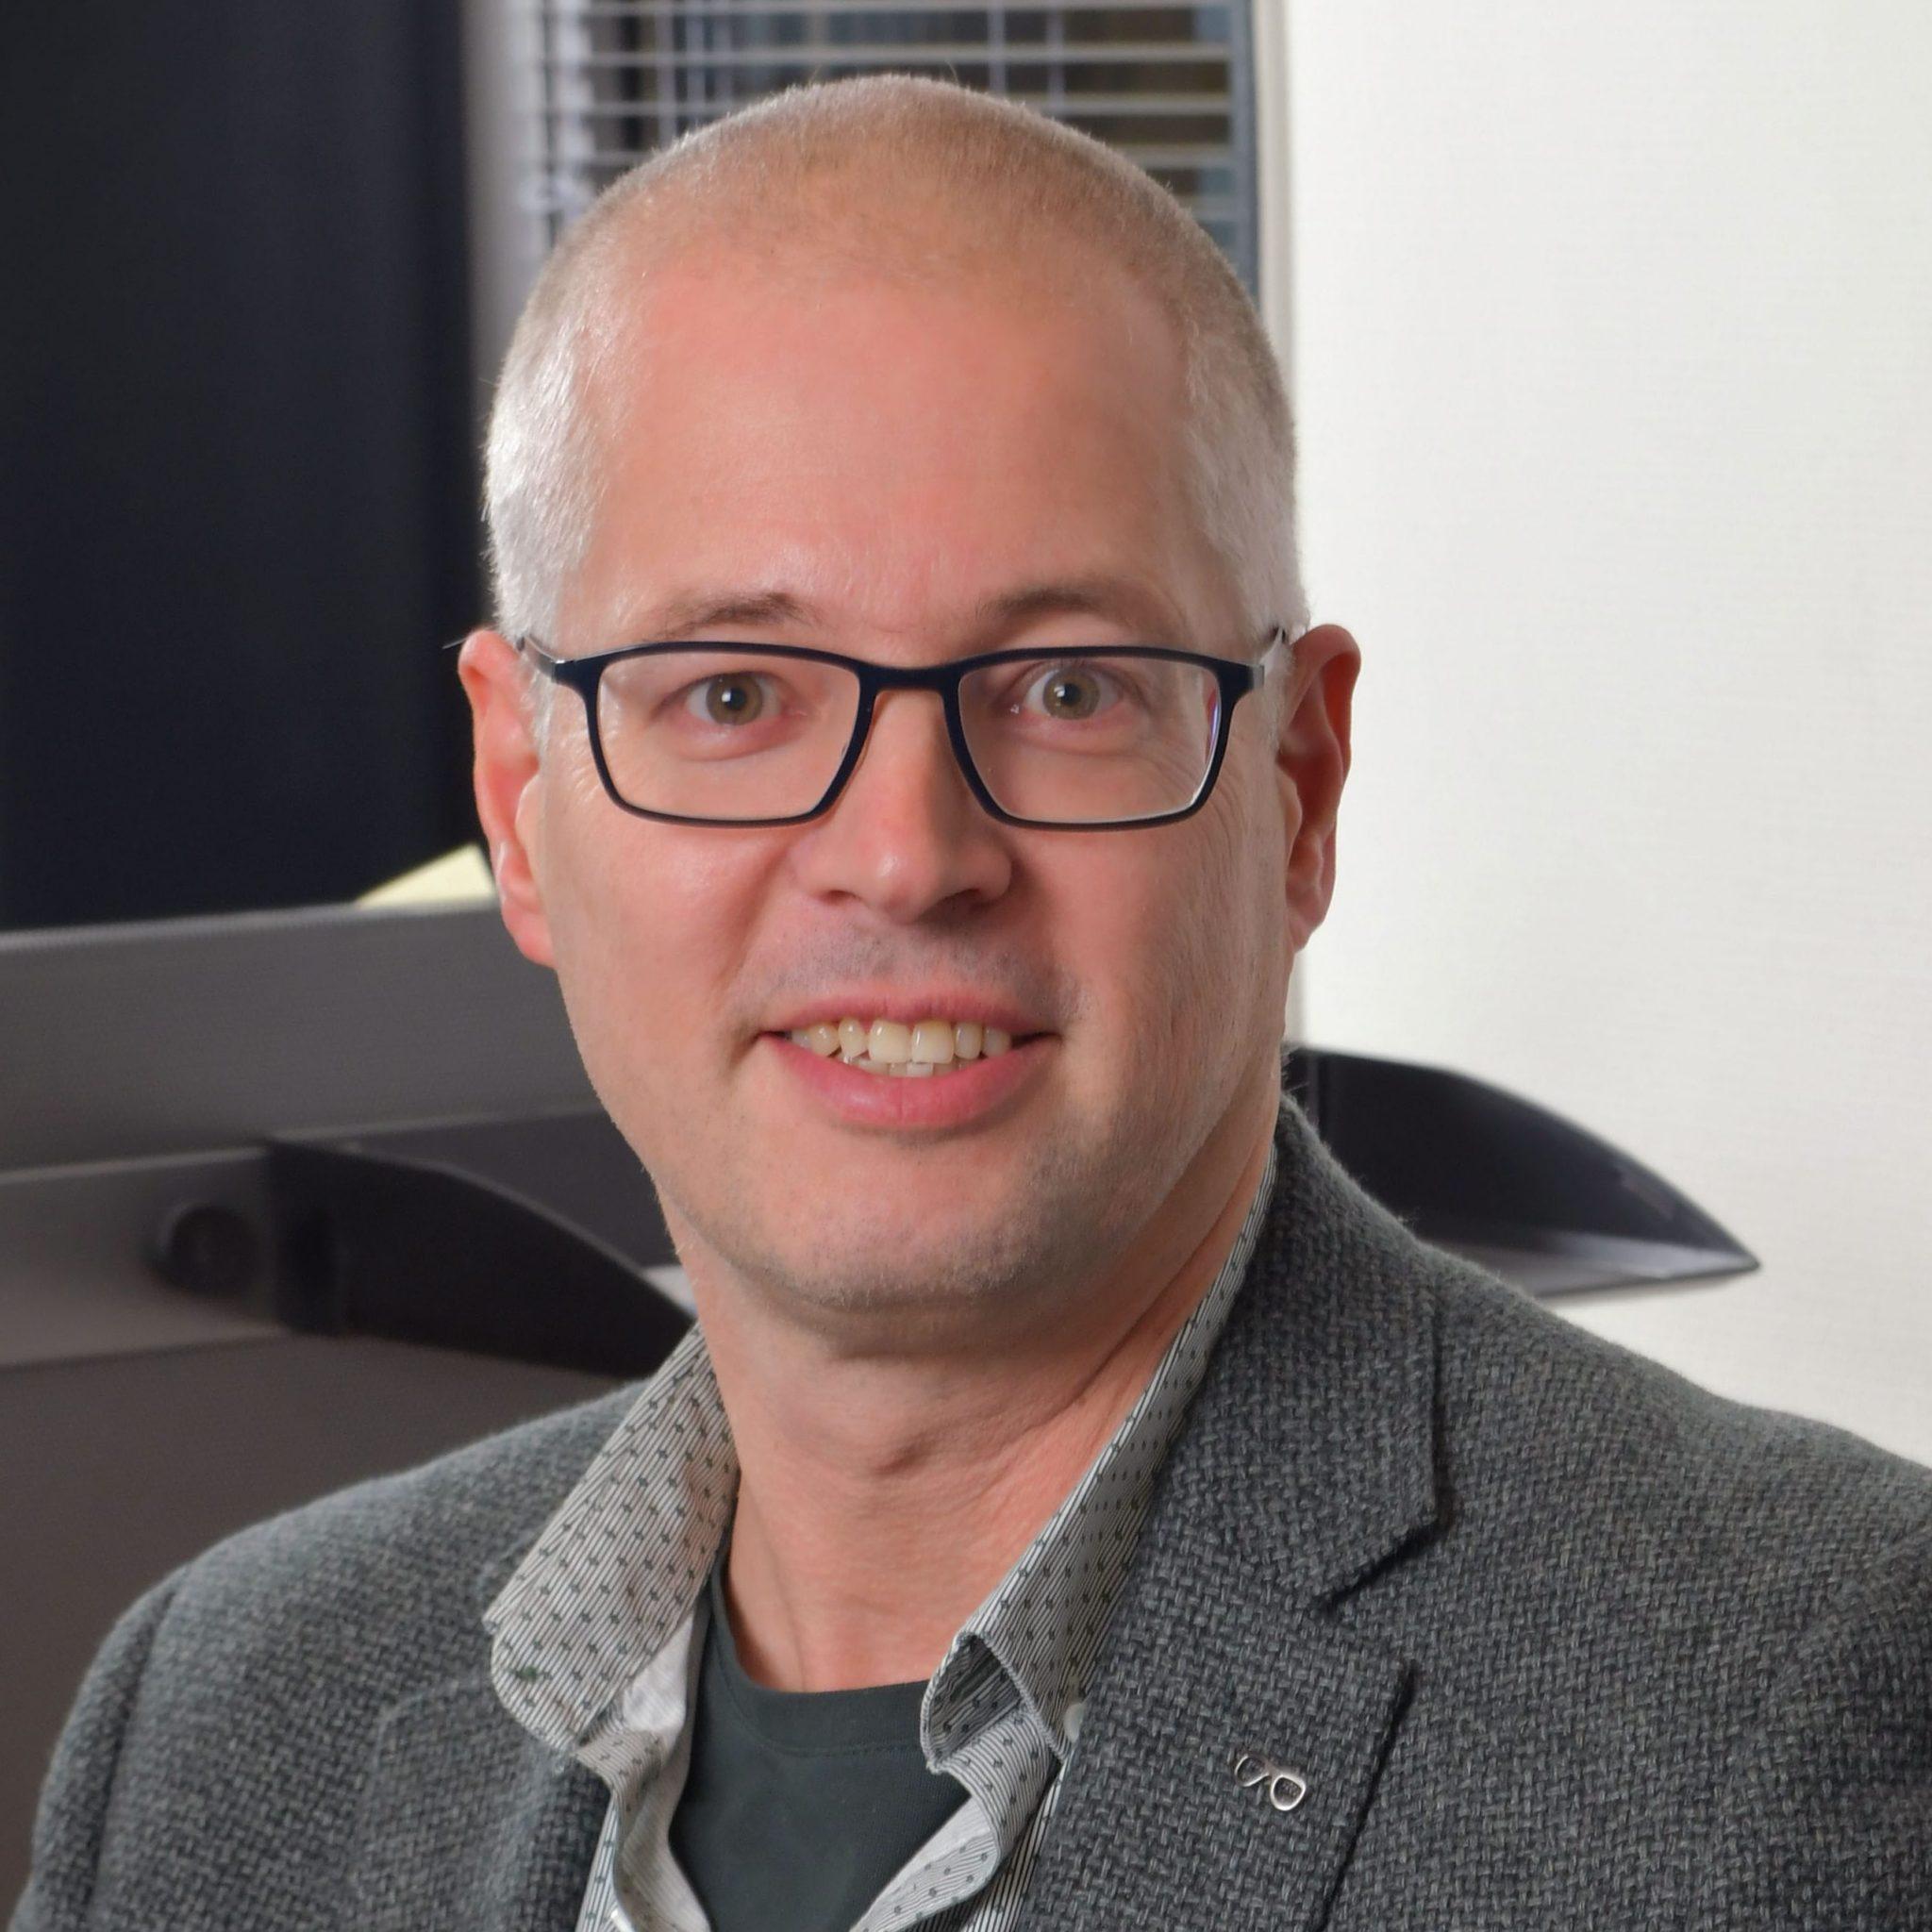 Mark Jeurissen